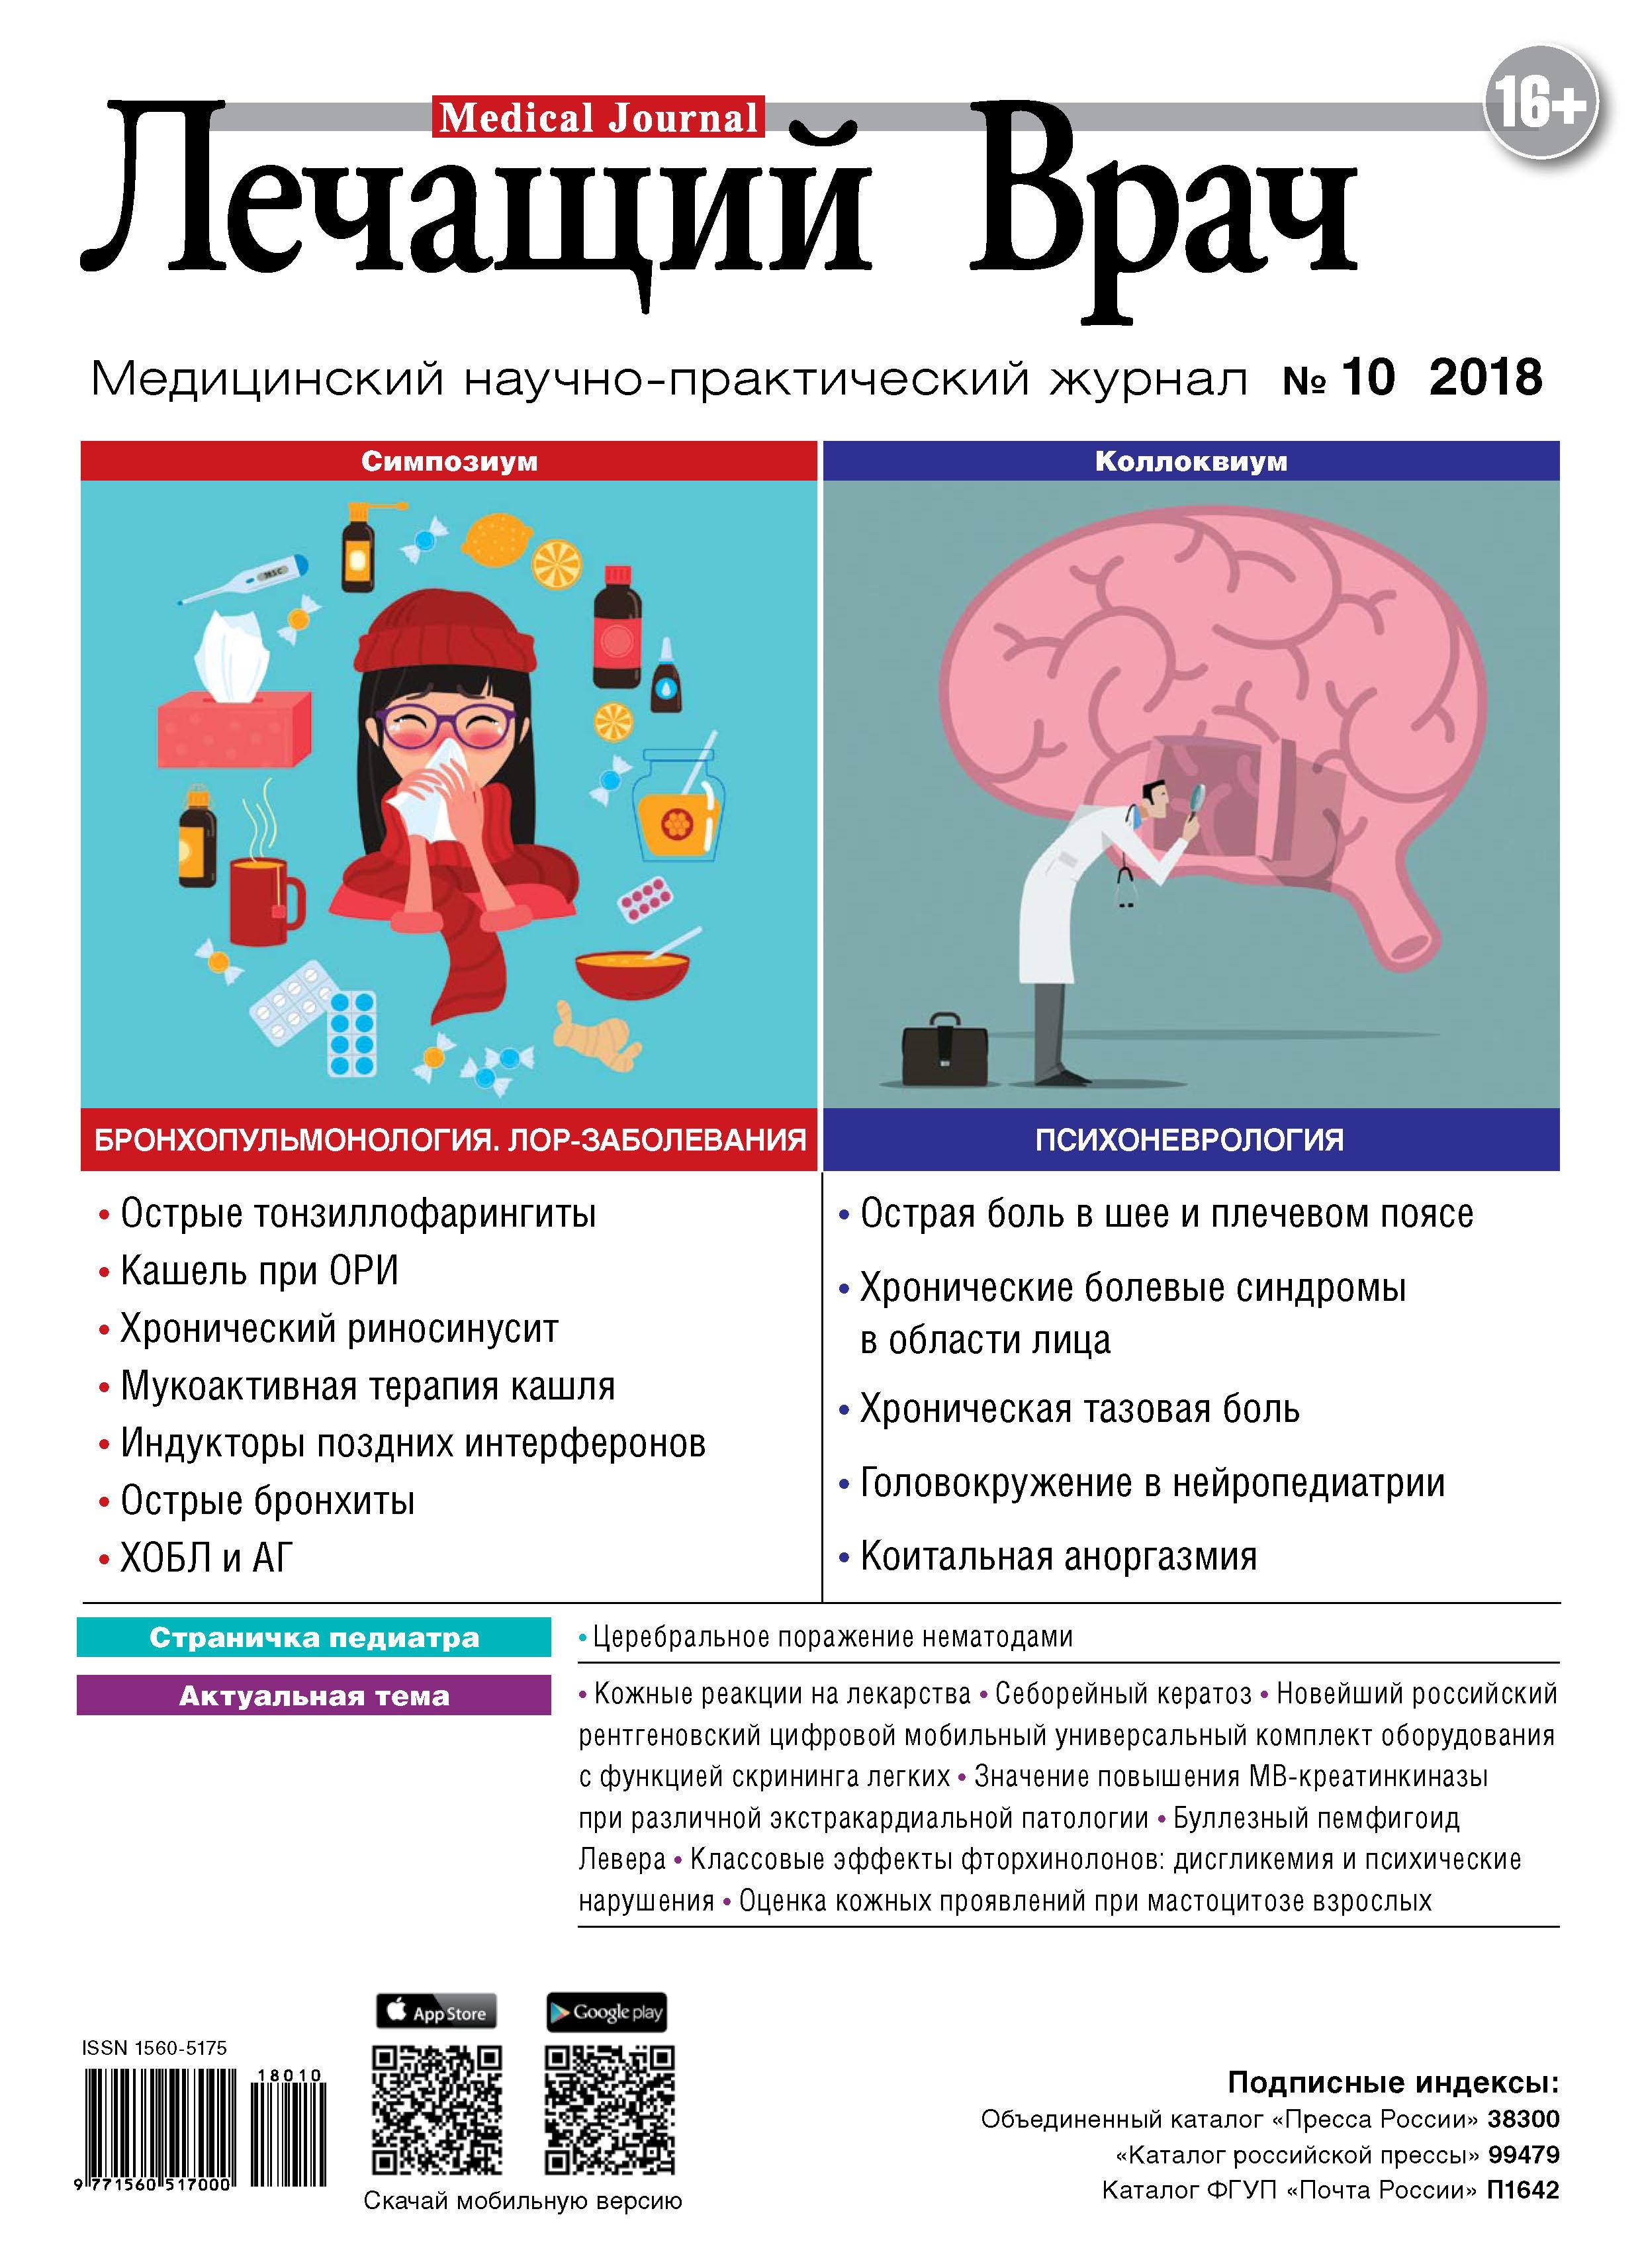 Журнал «Лечащий Врач» №10/2018